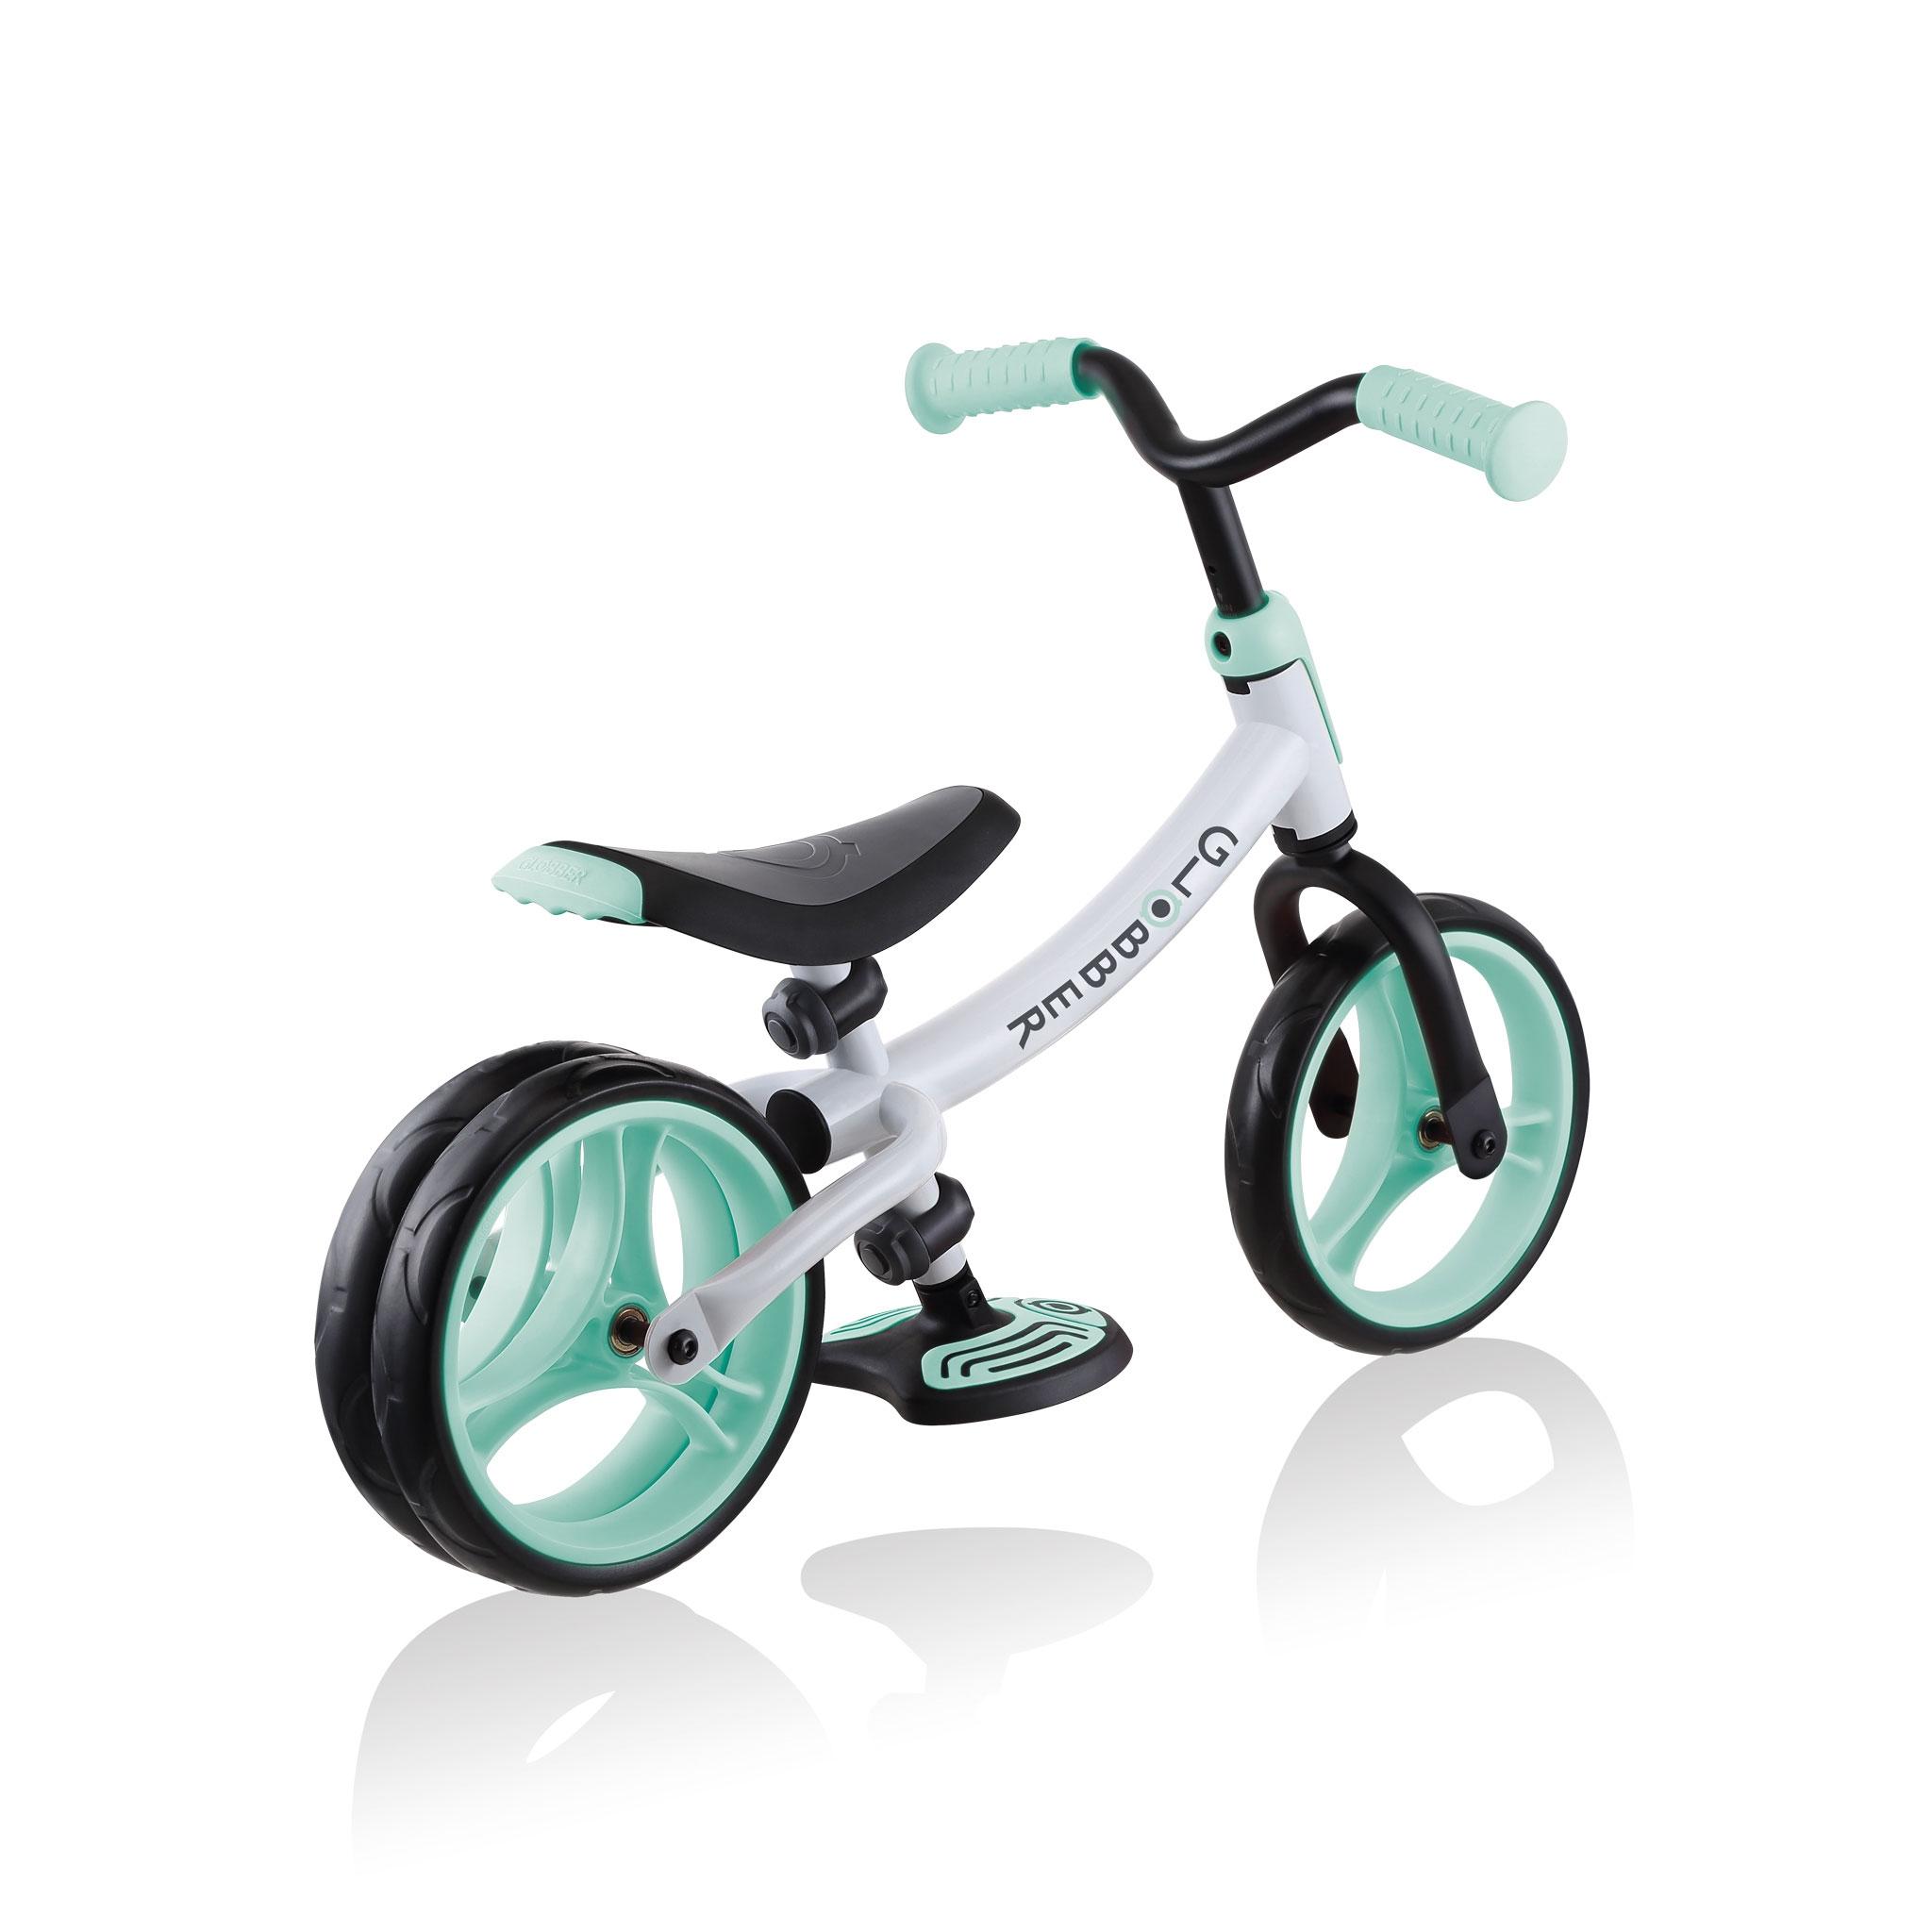 GO-BIKE-DUO-dual-rear-wheel-toddler-balance-bike-aids-balance-and-develops-motor-skills_mint